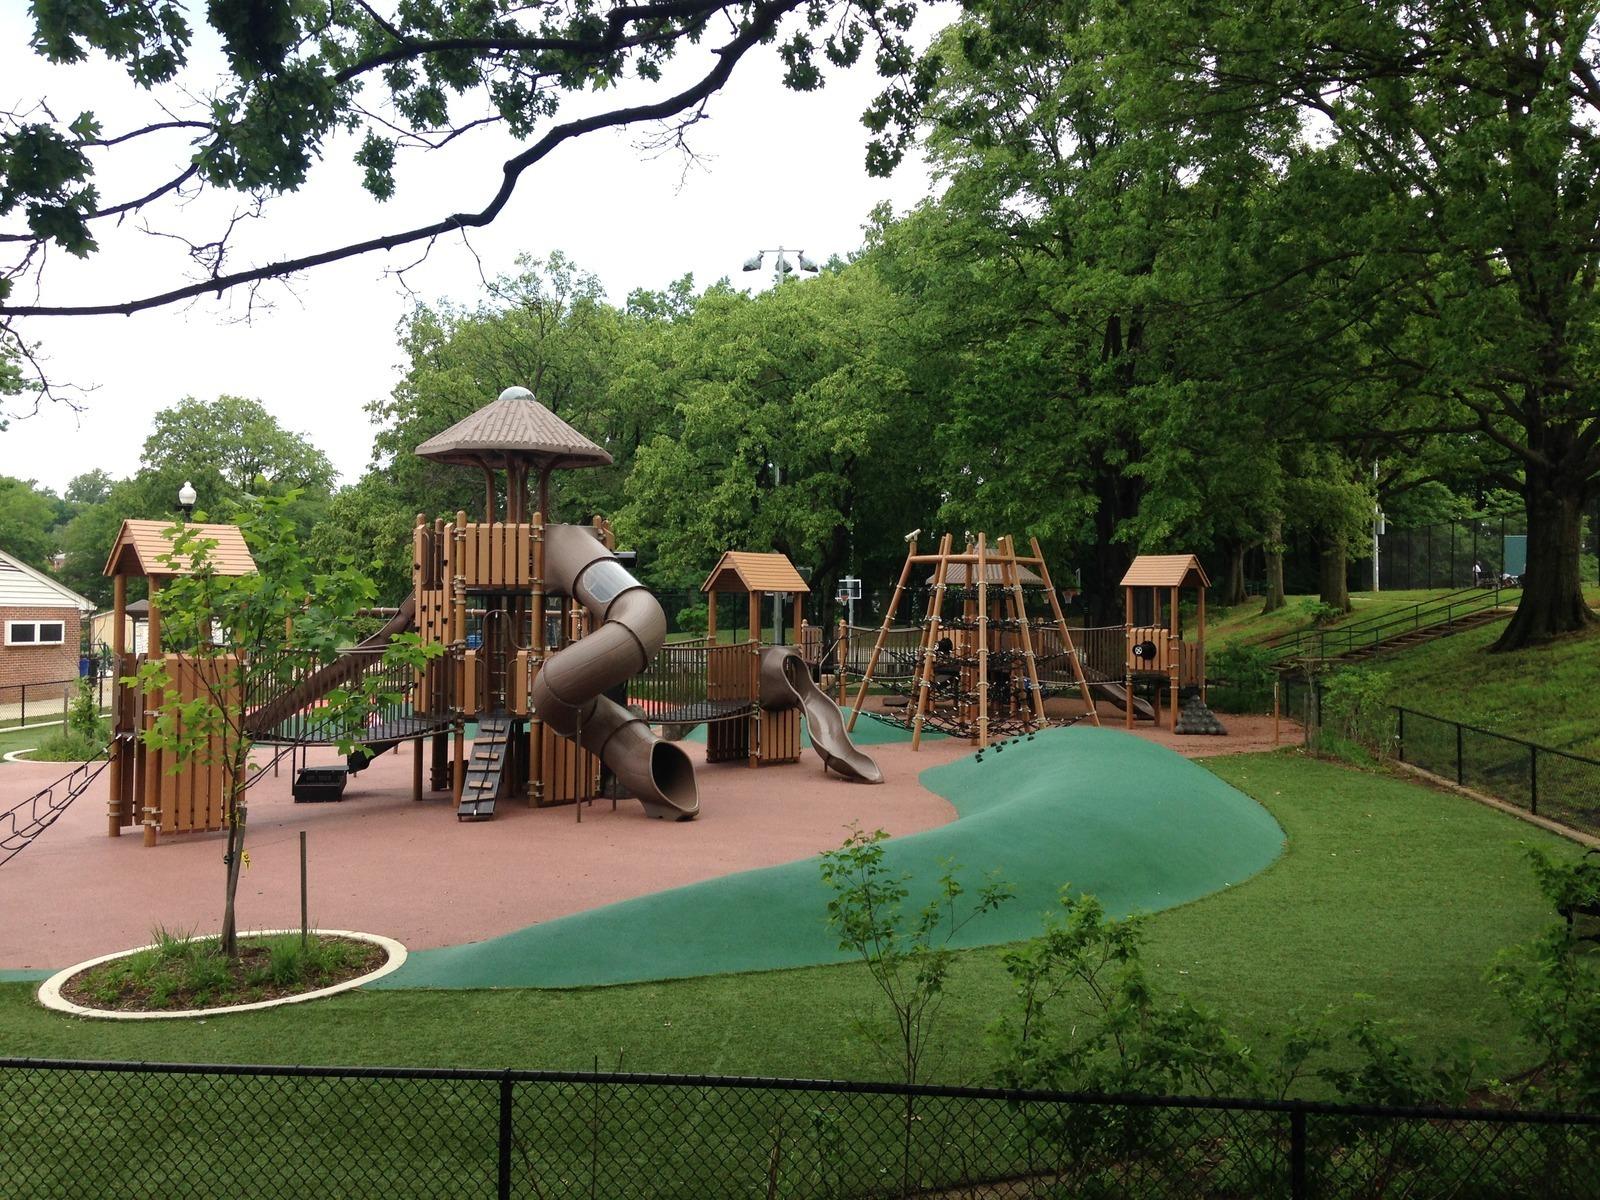 Fort Stevens Recreation Center Playground in Washington, DC